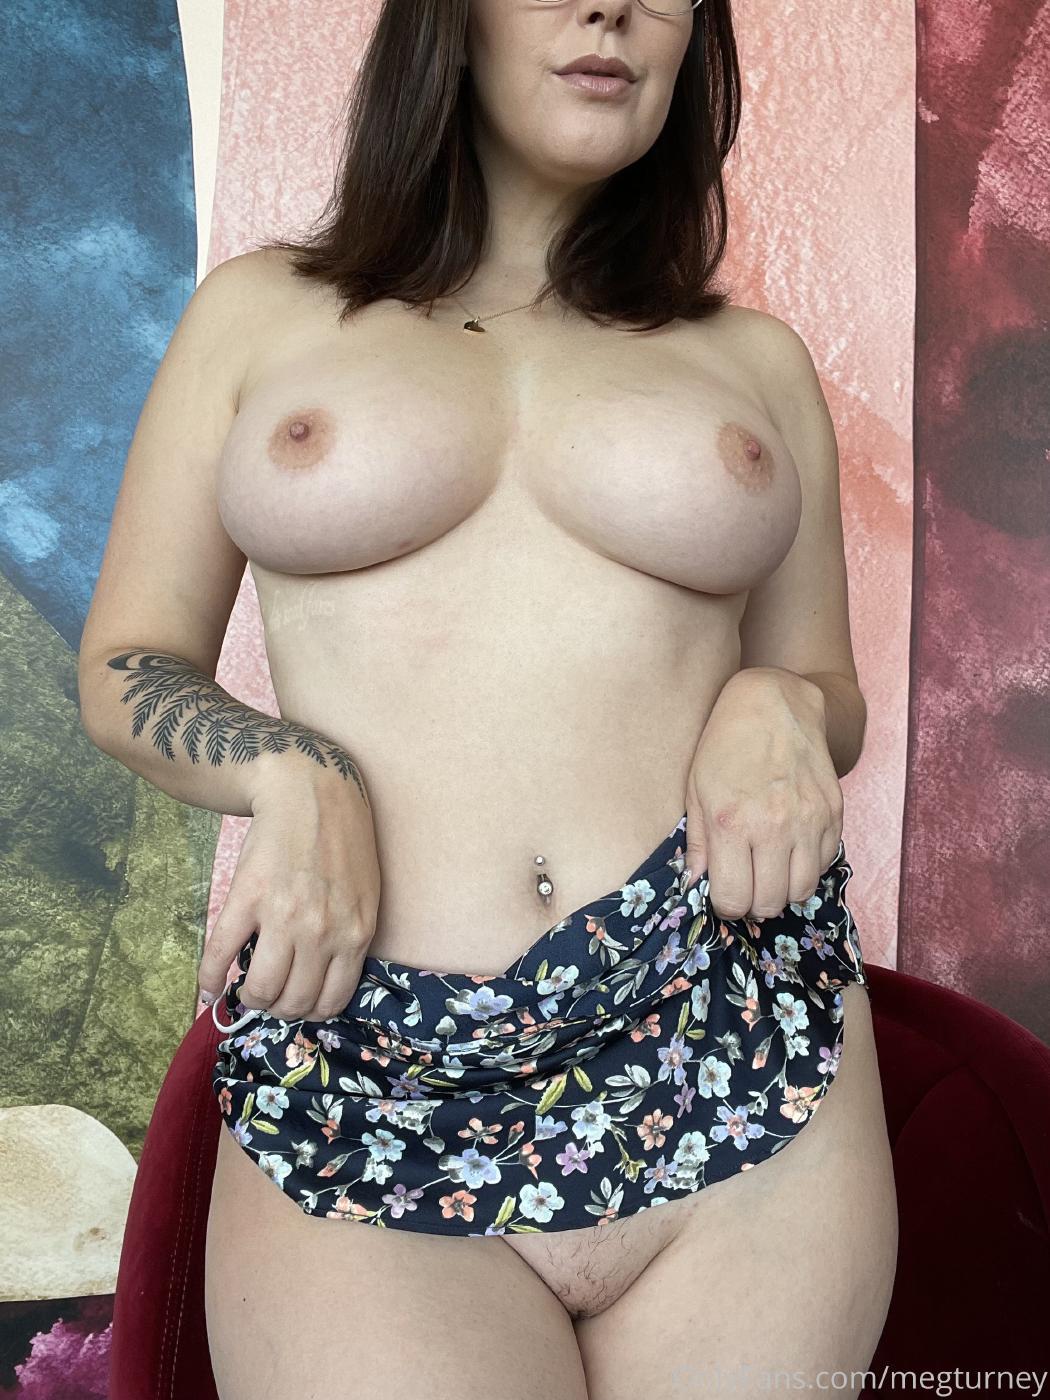 Meg Turney Unshaven Pussy Candids Onlyfans Set Leaked Rfqbmd